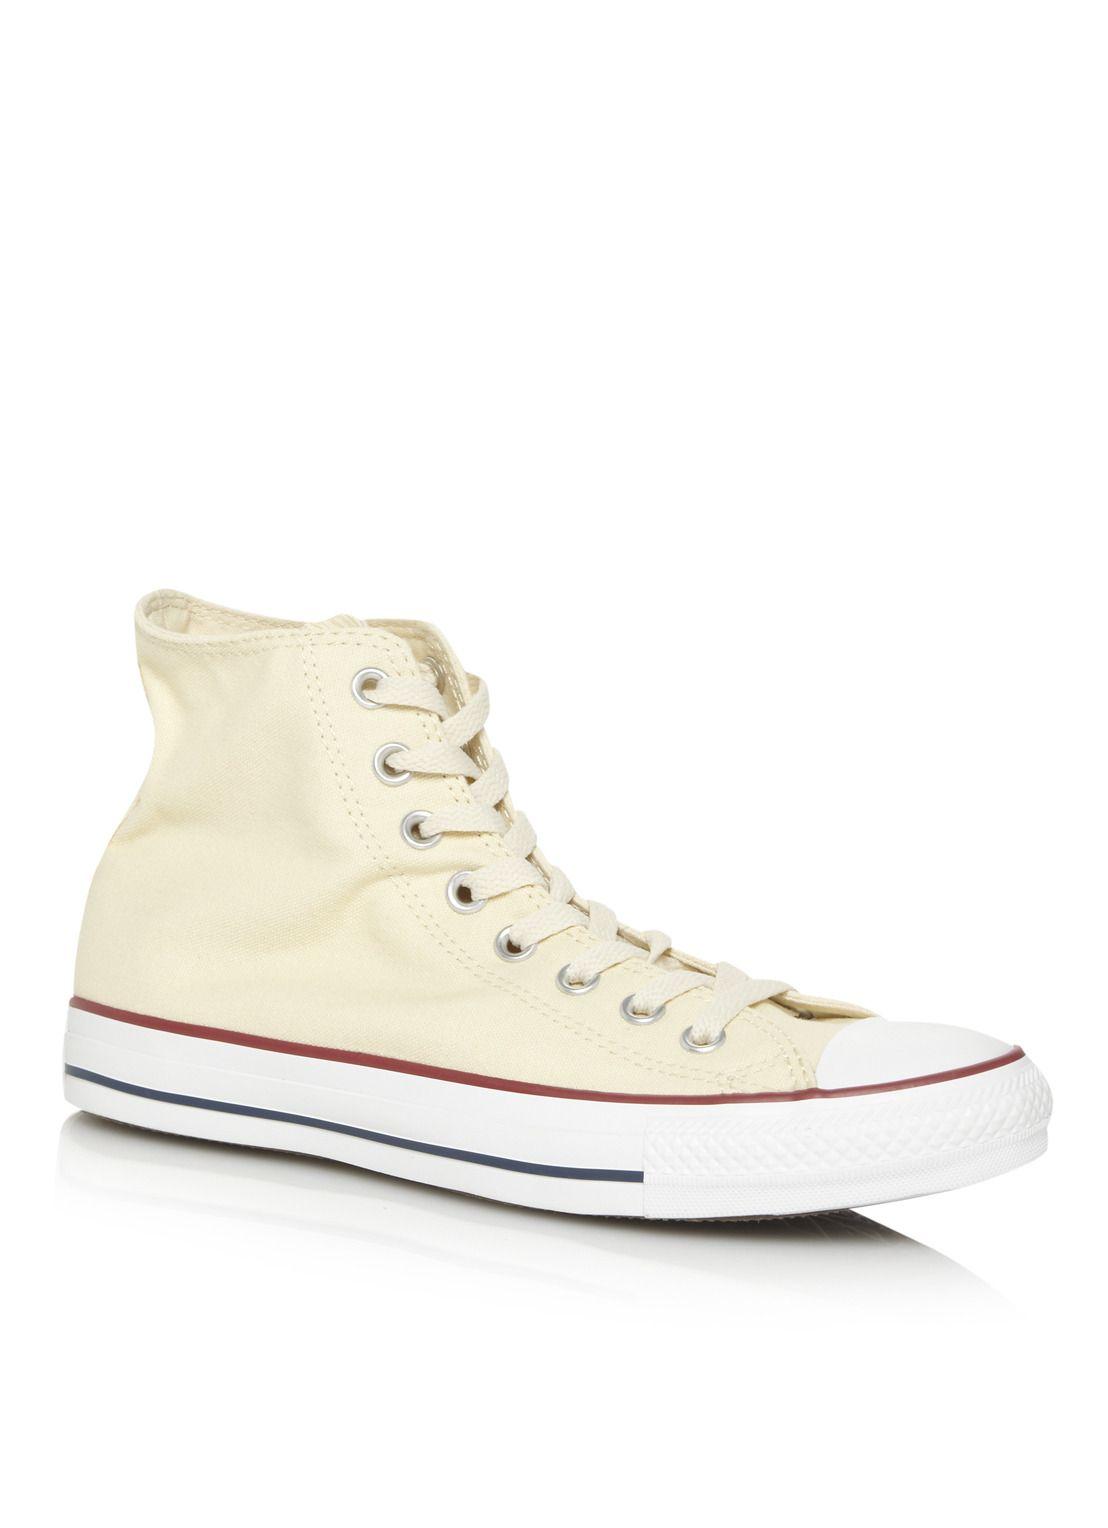 c24642d9b4c Converse   Converse Hoge sneaker van textiel - deBijenkorf.nl. All  StarConverse